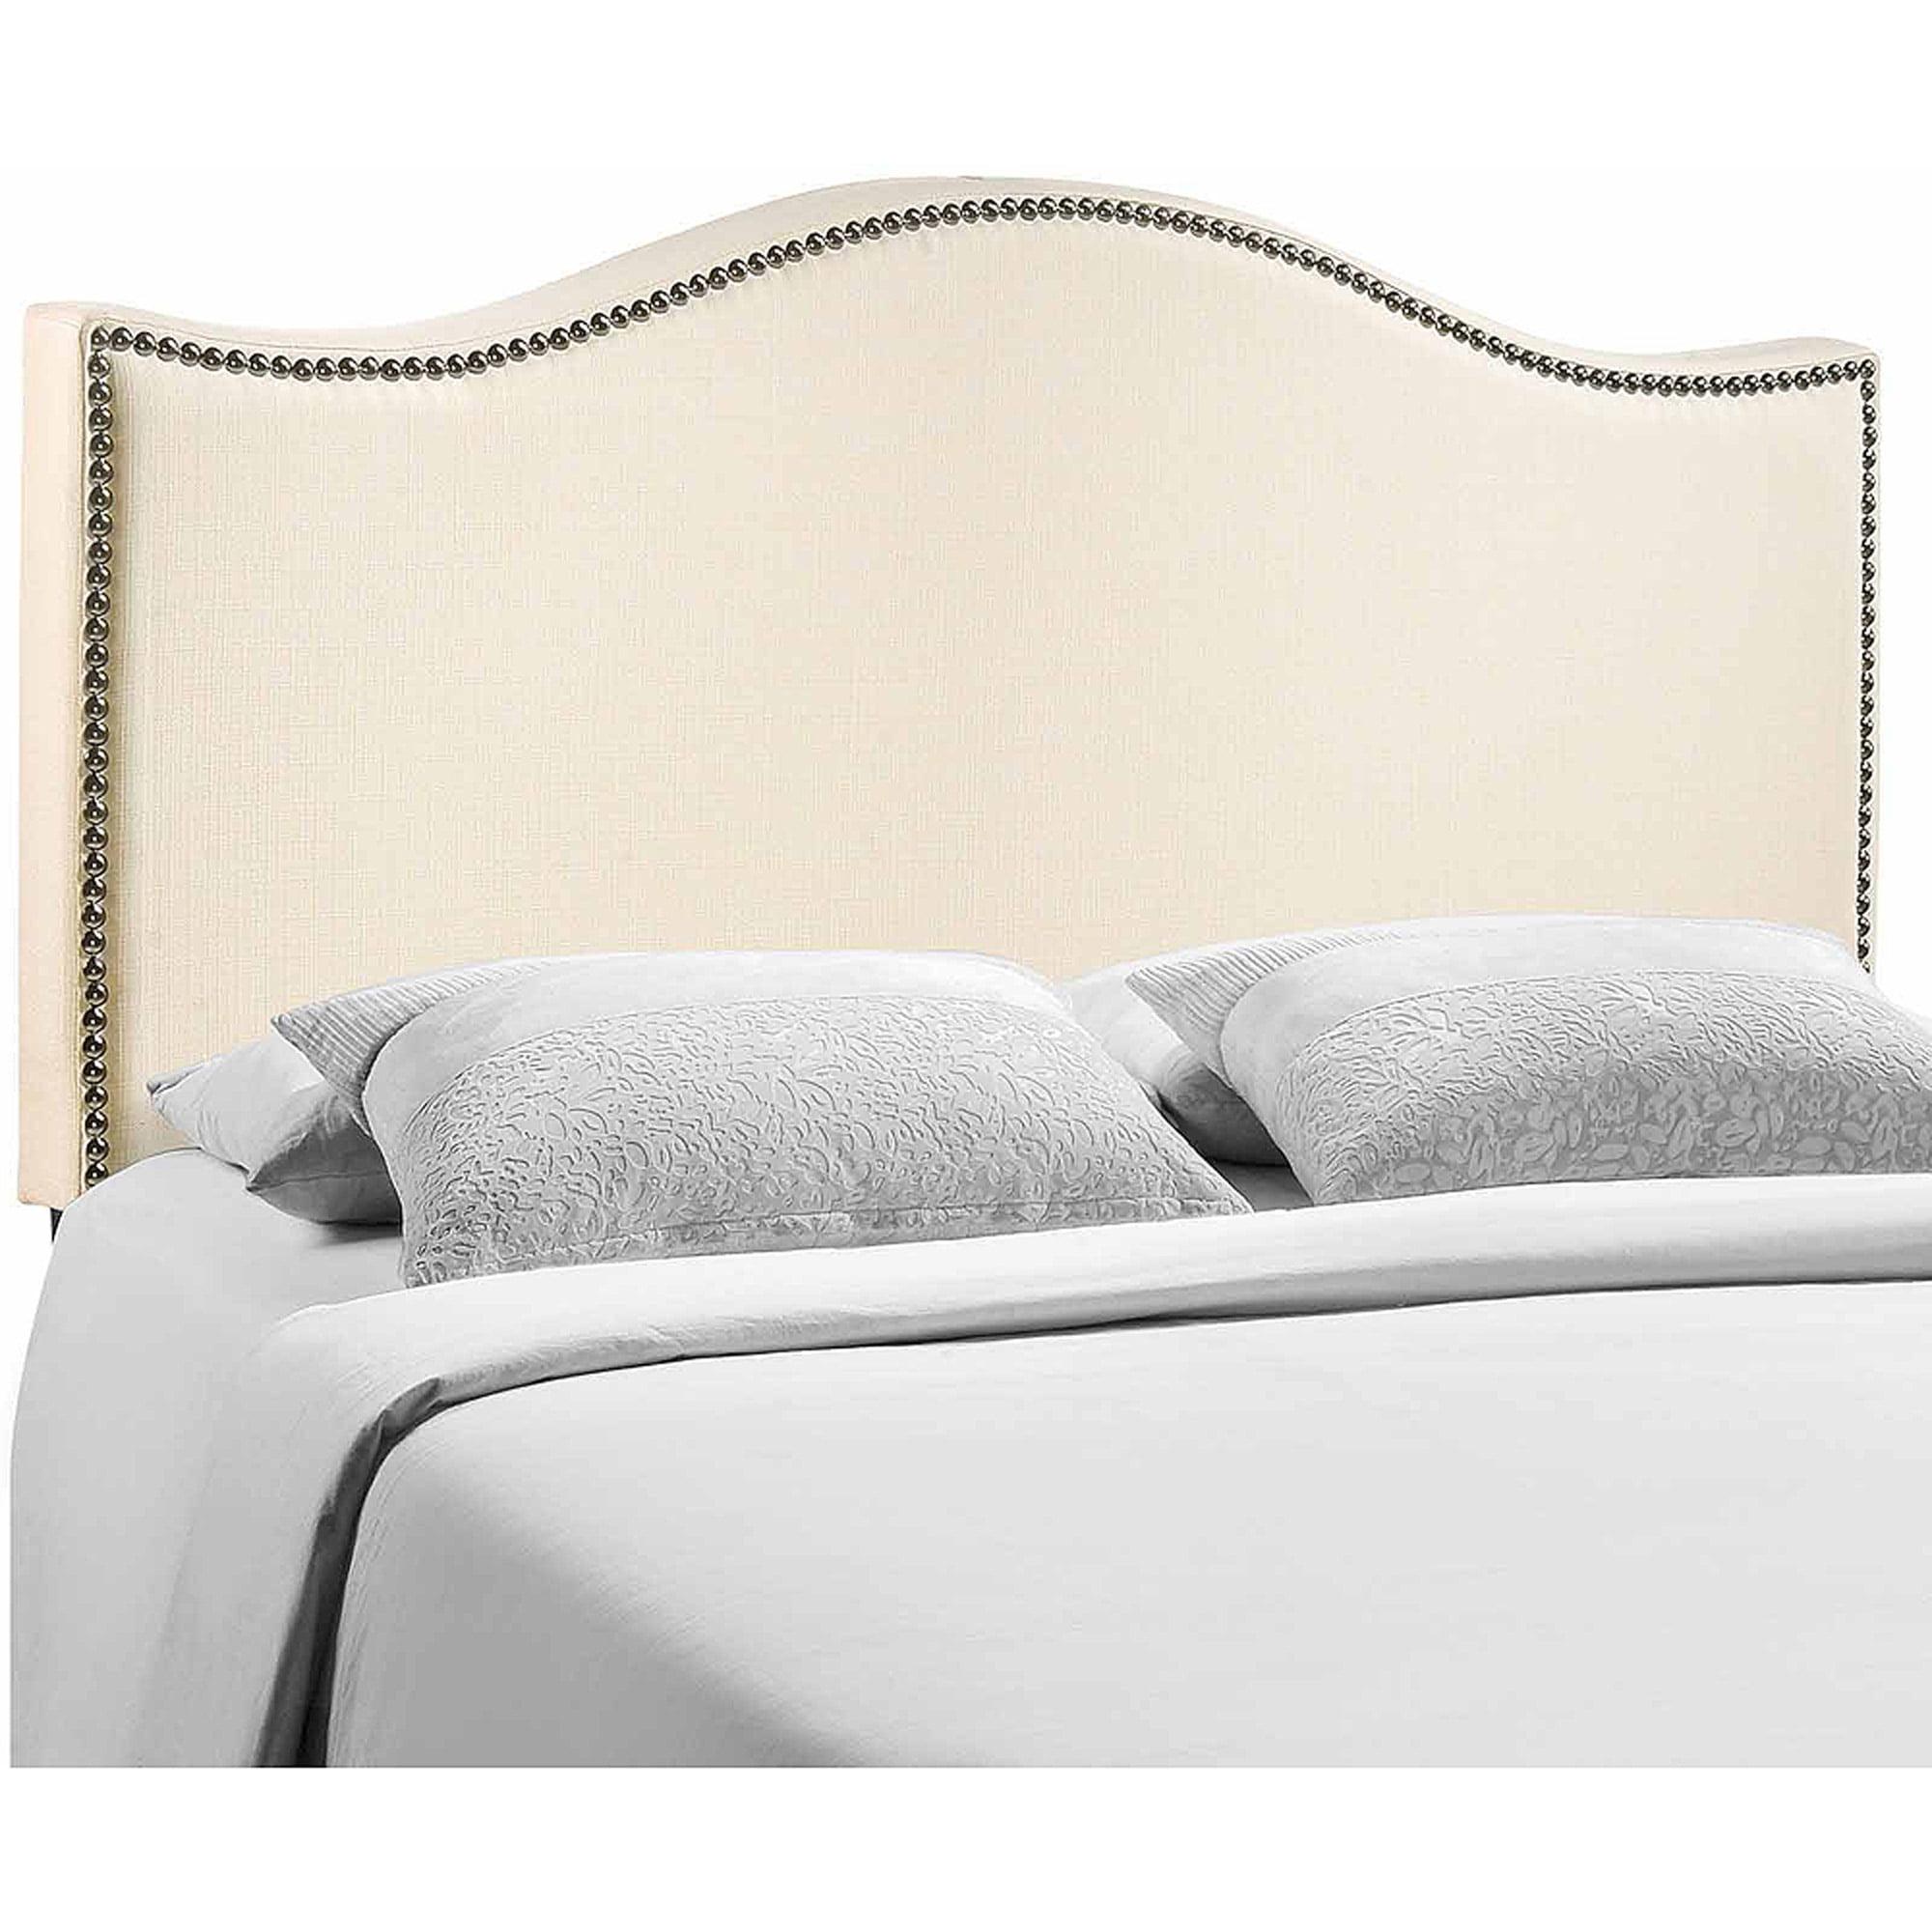 coaster murrieta upholstered headboard multiple sizes and colors walmartcom - Headbored